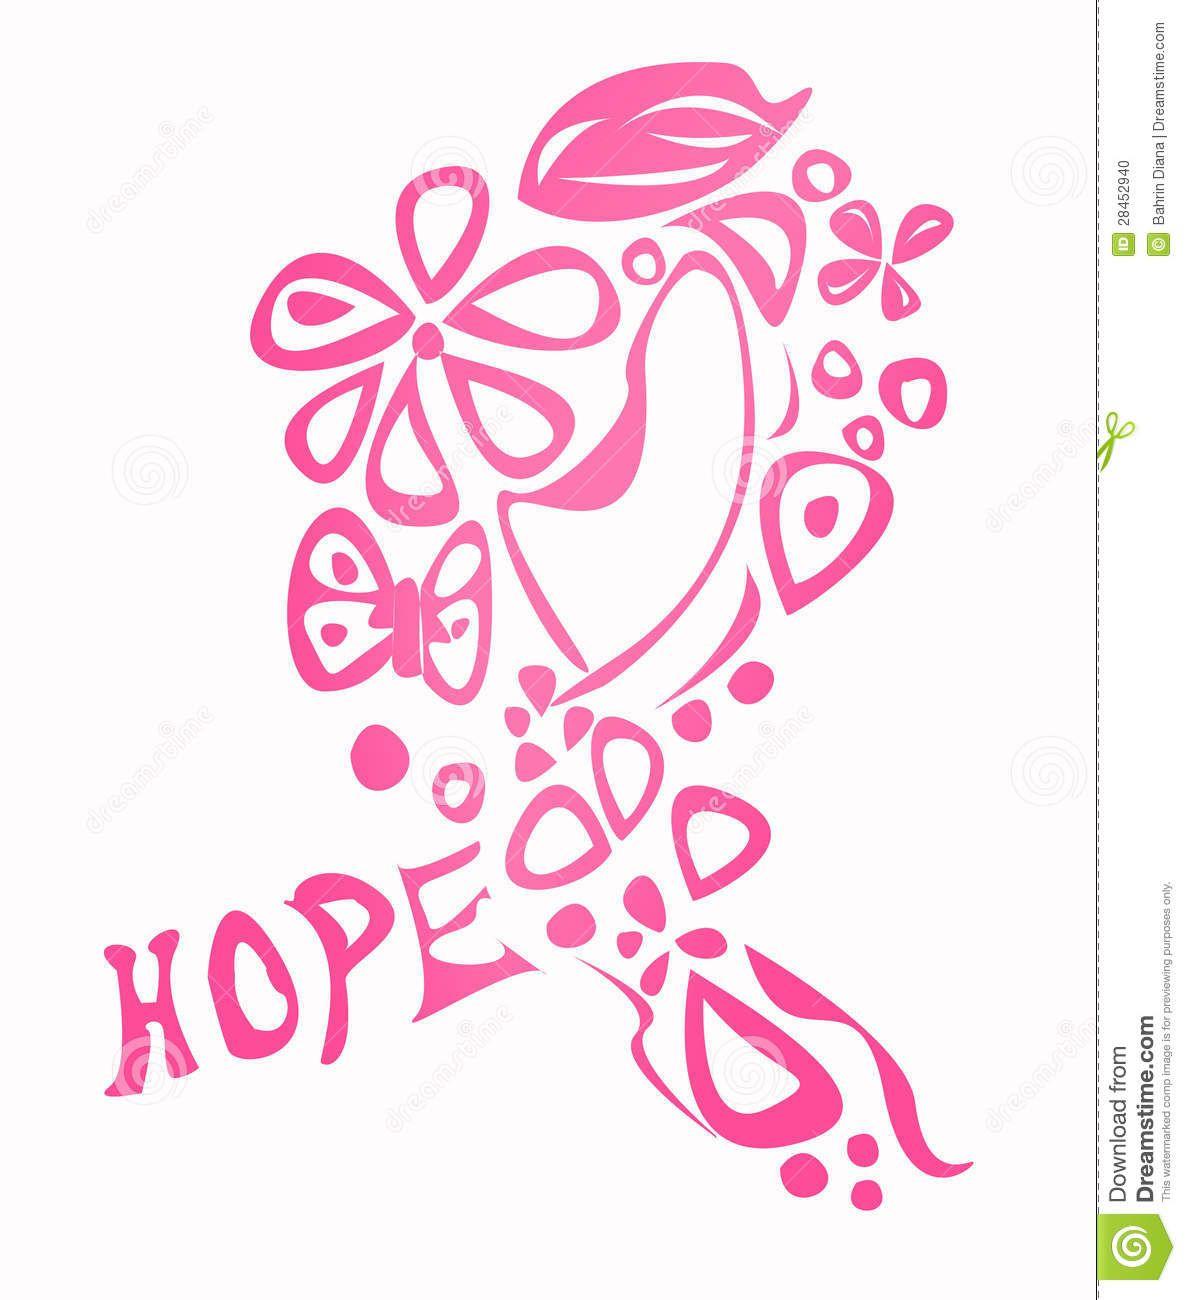 Breast cancer awareness ribbon stock photo image 28452940 breast cancer awareness ribbon stock photo image 28452940 biocorpaavc Choice Image